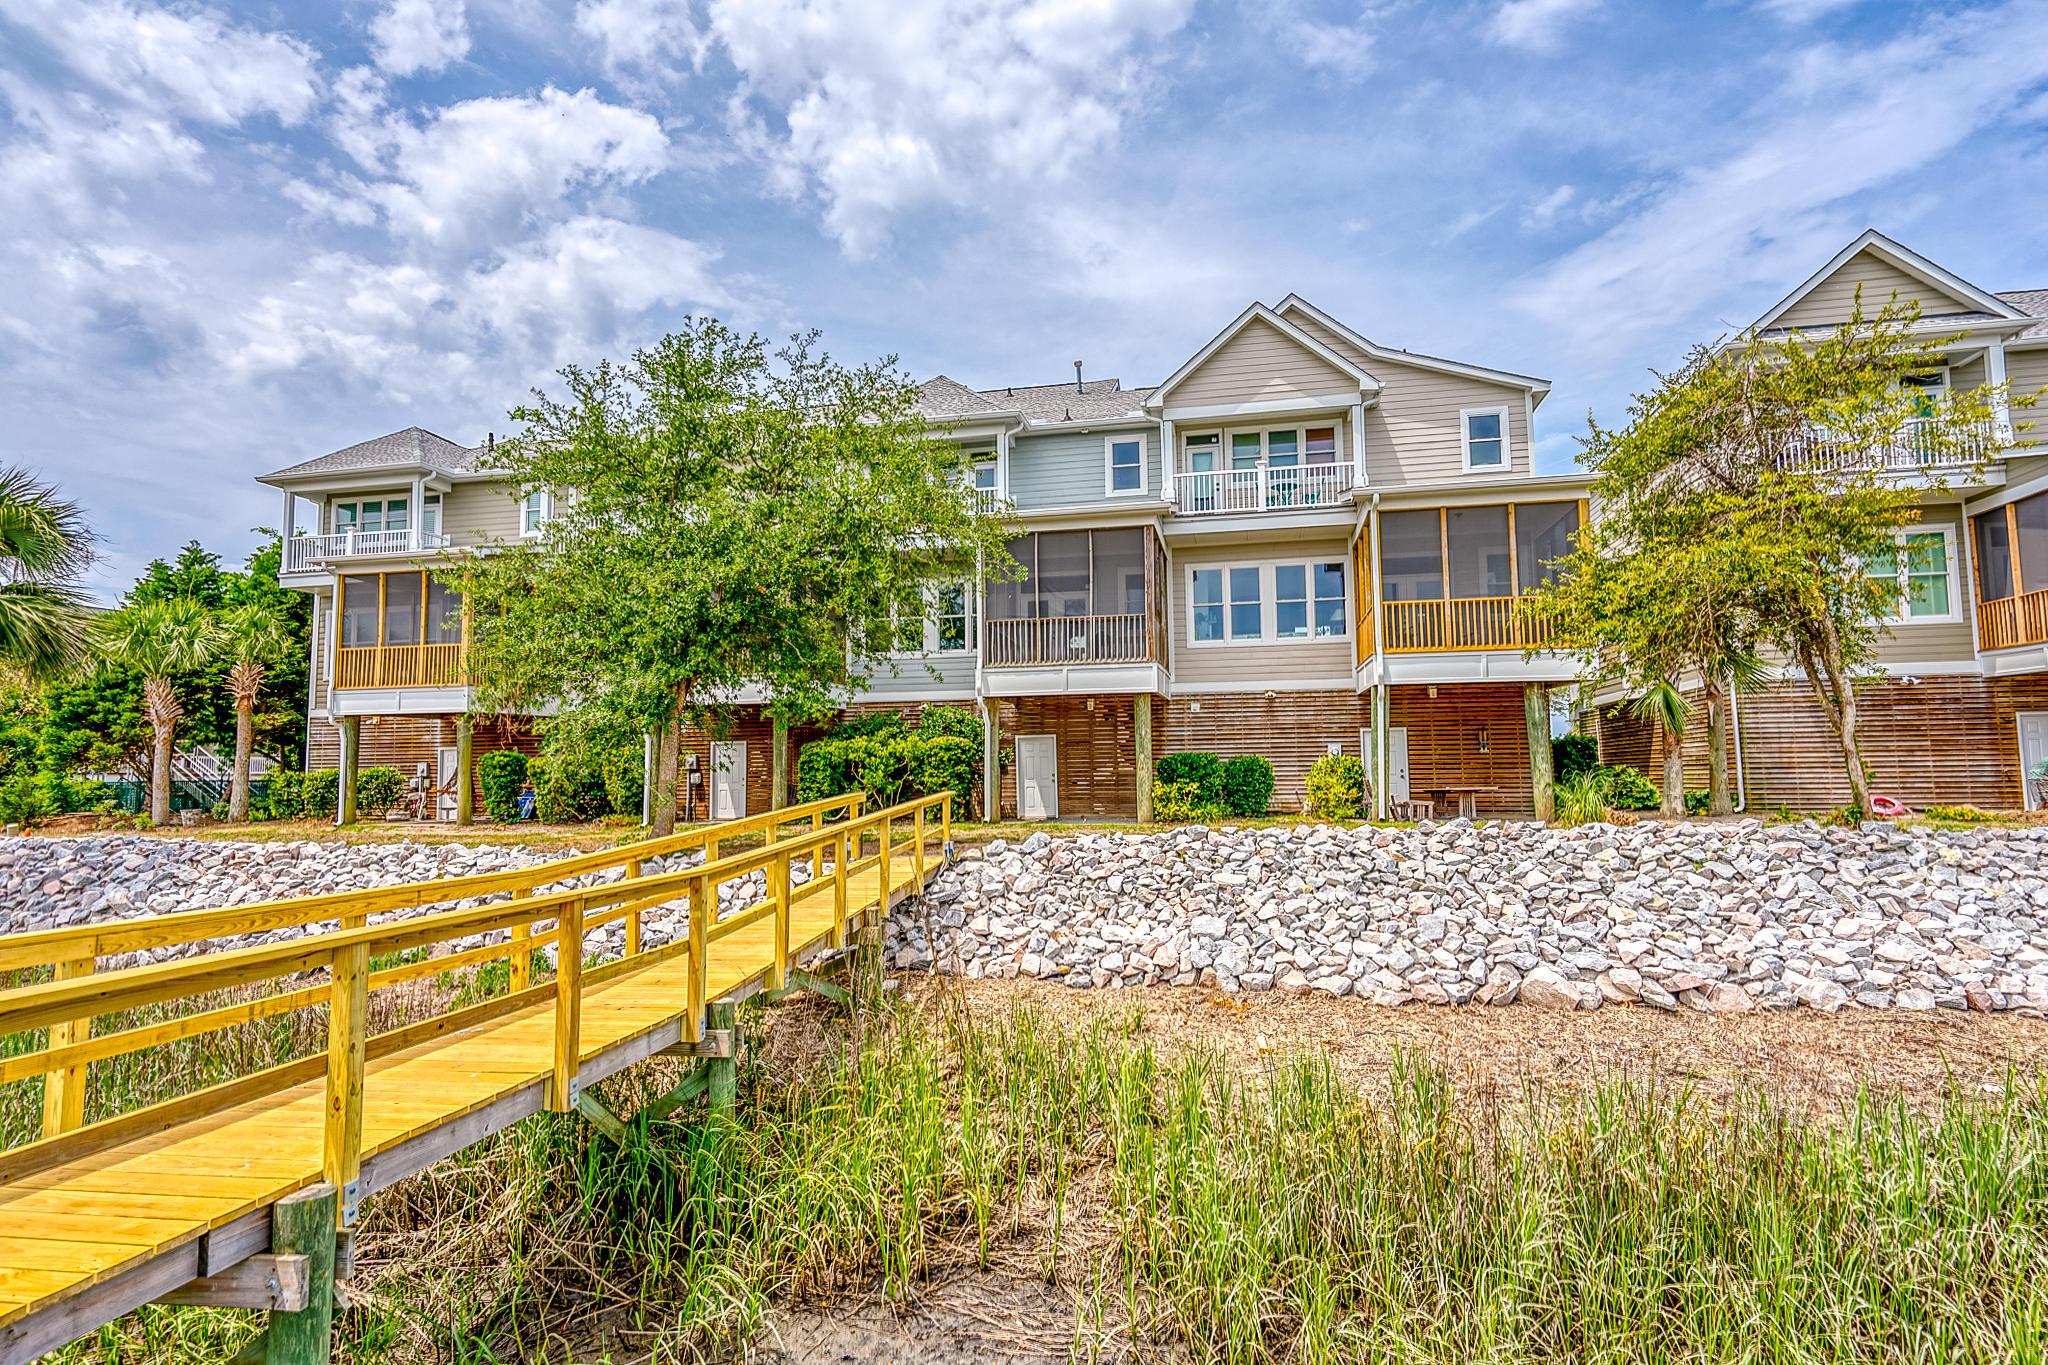 Folly Creek Place Homes For Sale - 2238 Folly Road, Folly Beach, SC - 24